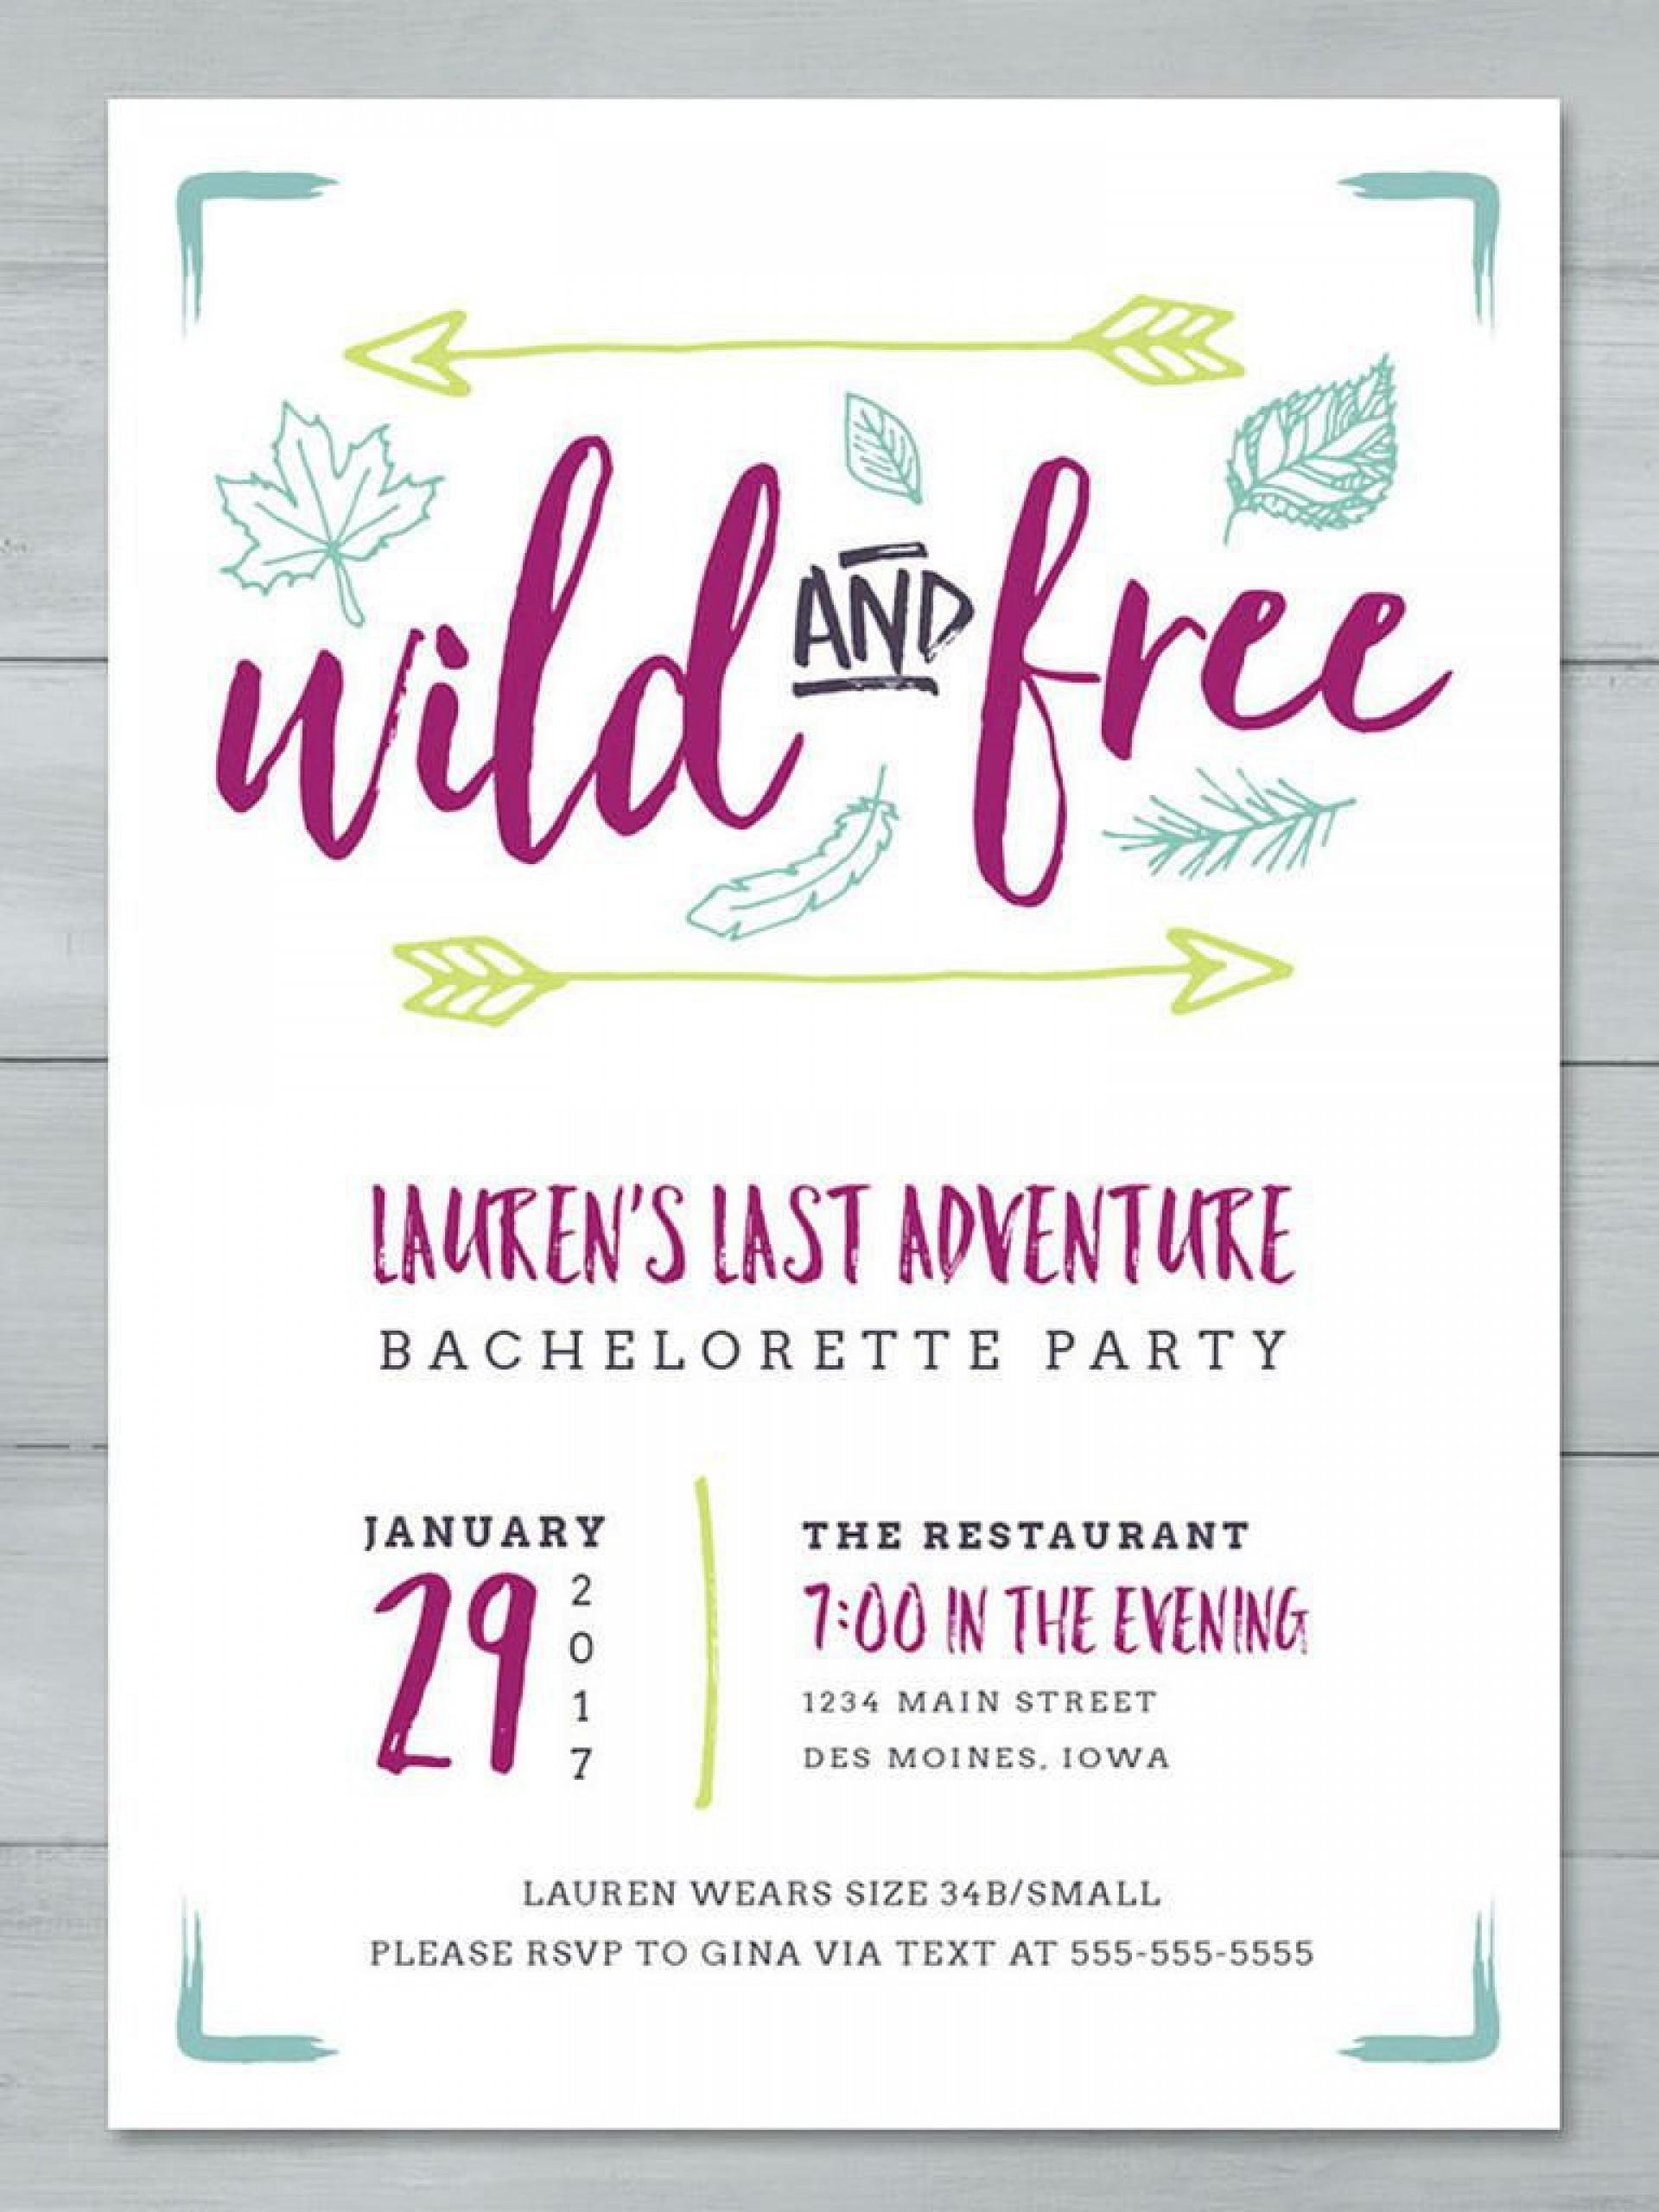 003 Wondrou Bachelorette Party Itinerary Template Free Design  Download1920